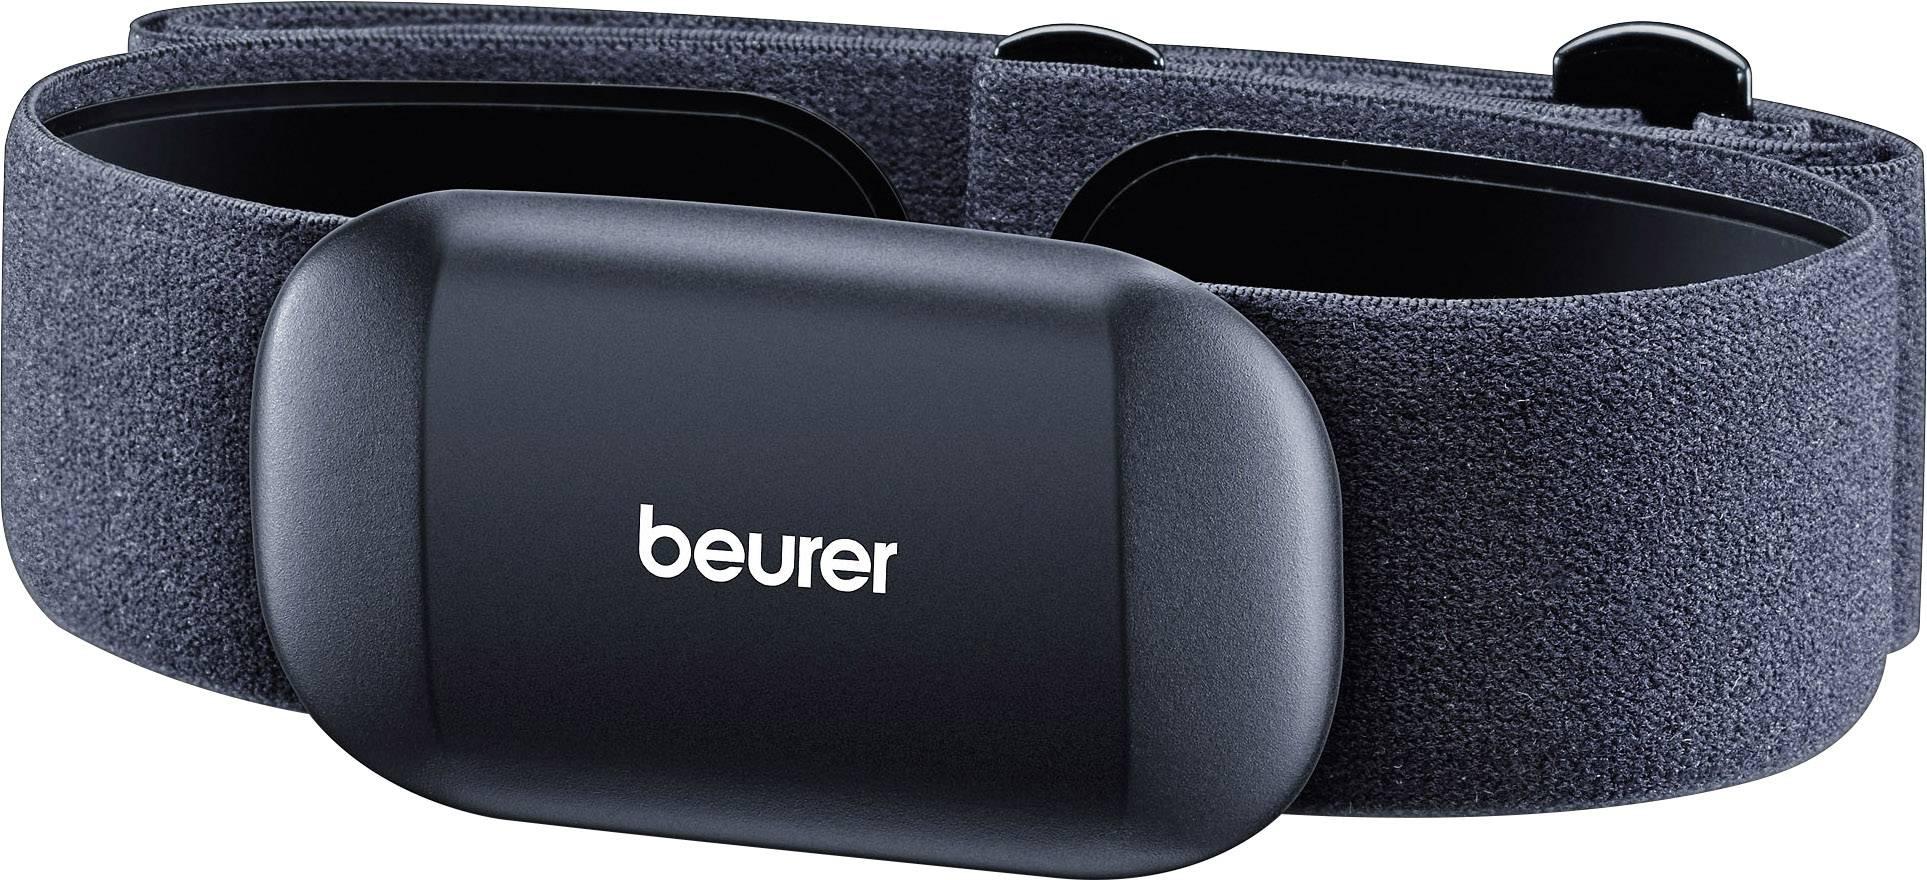 Hrudní pás Beurer PM 235 676.26, Bluetooth